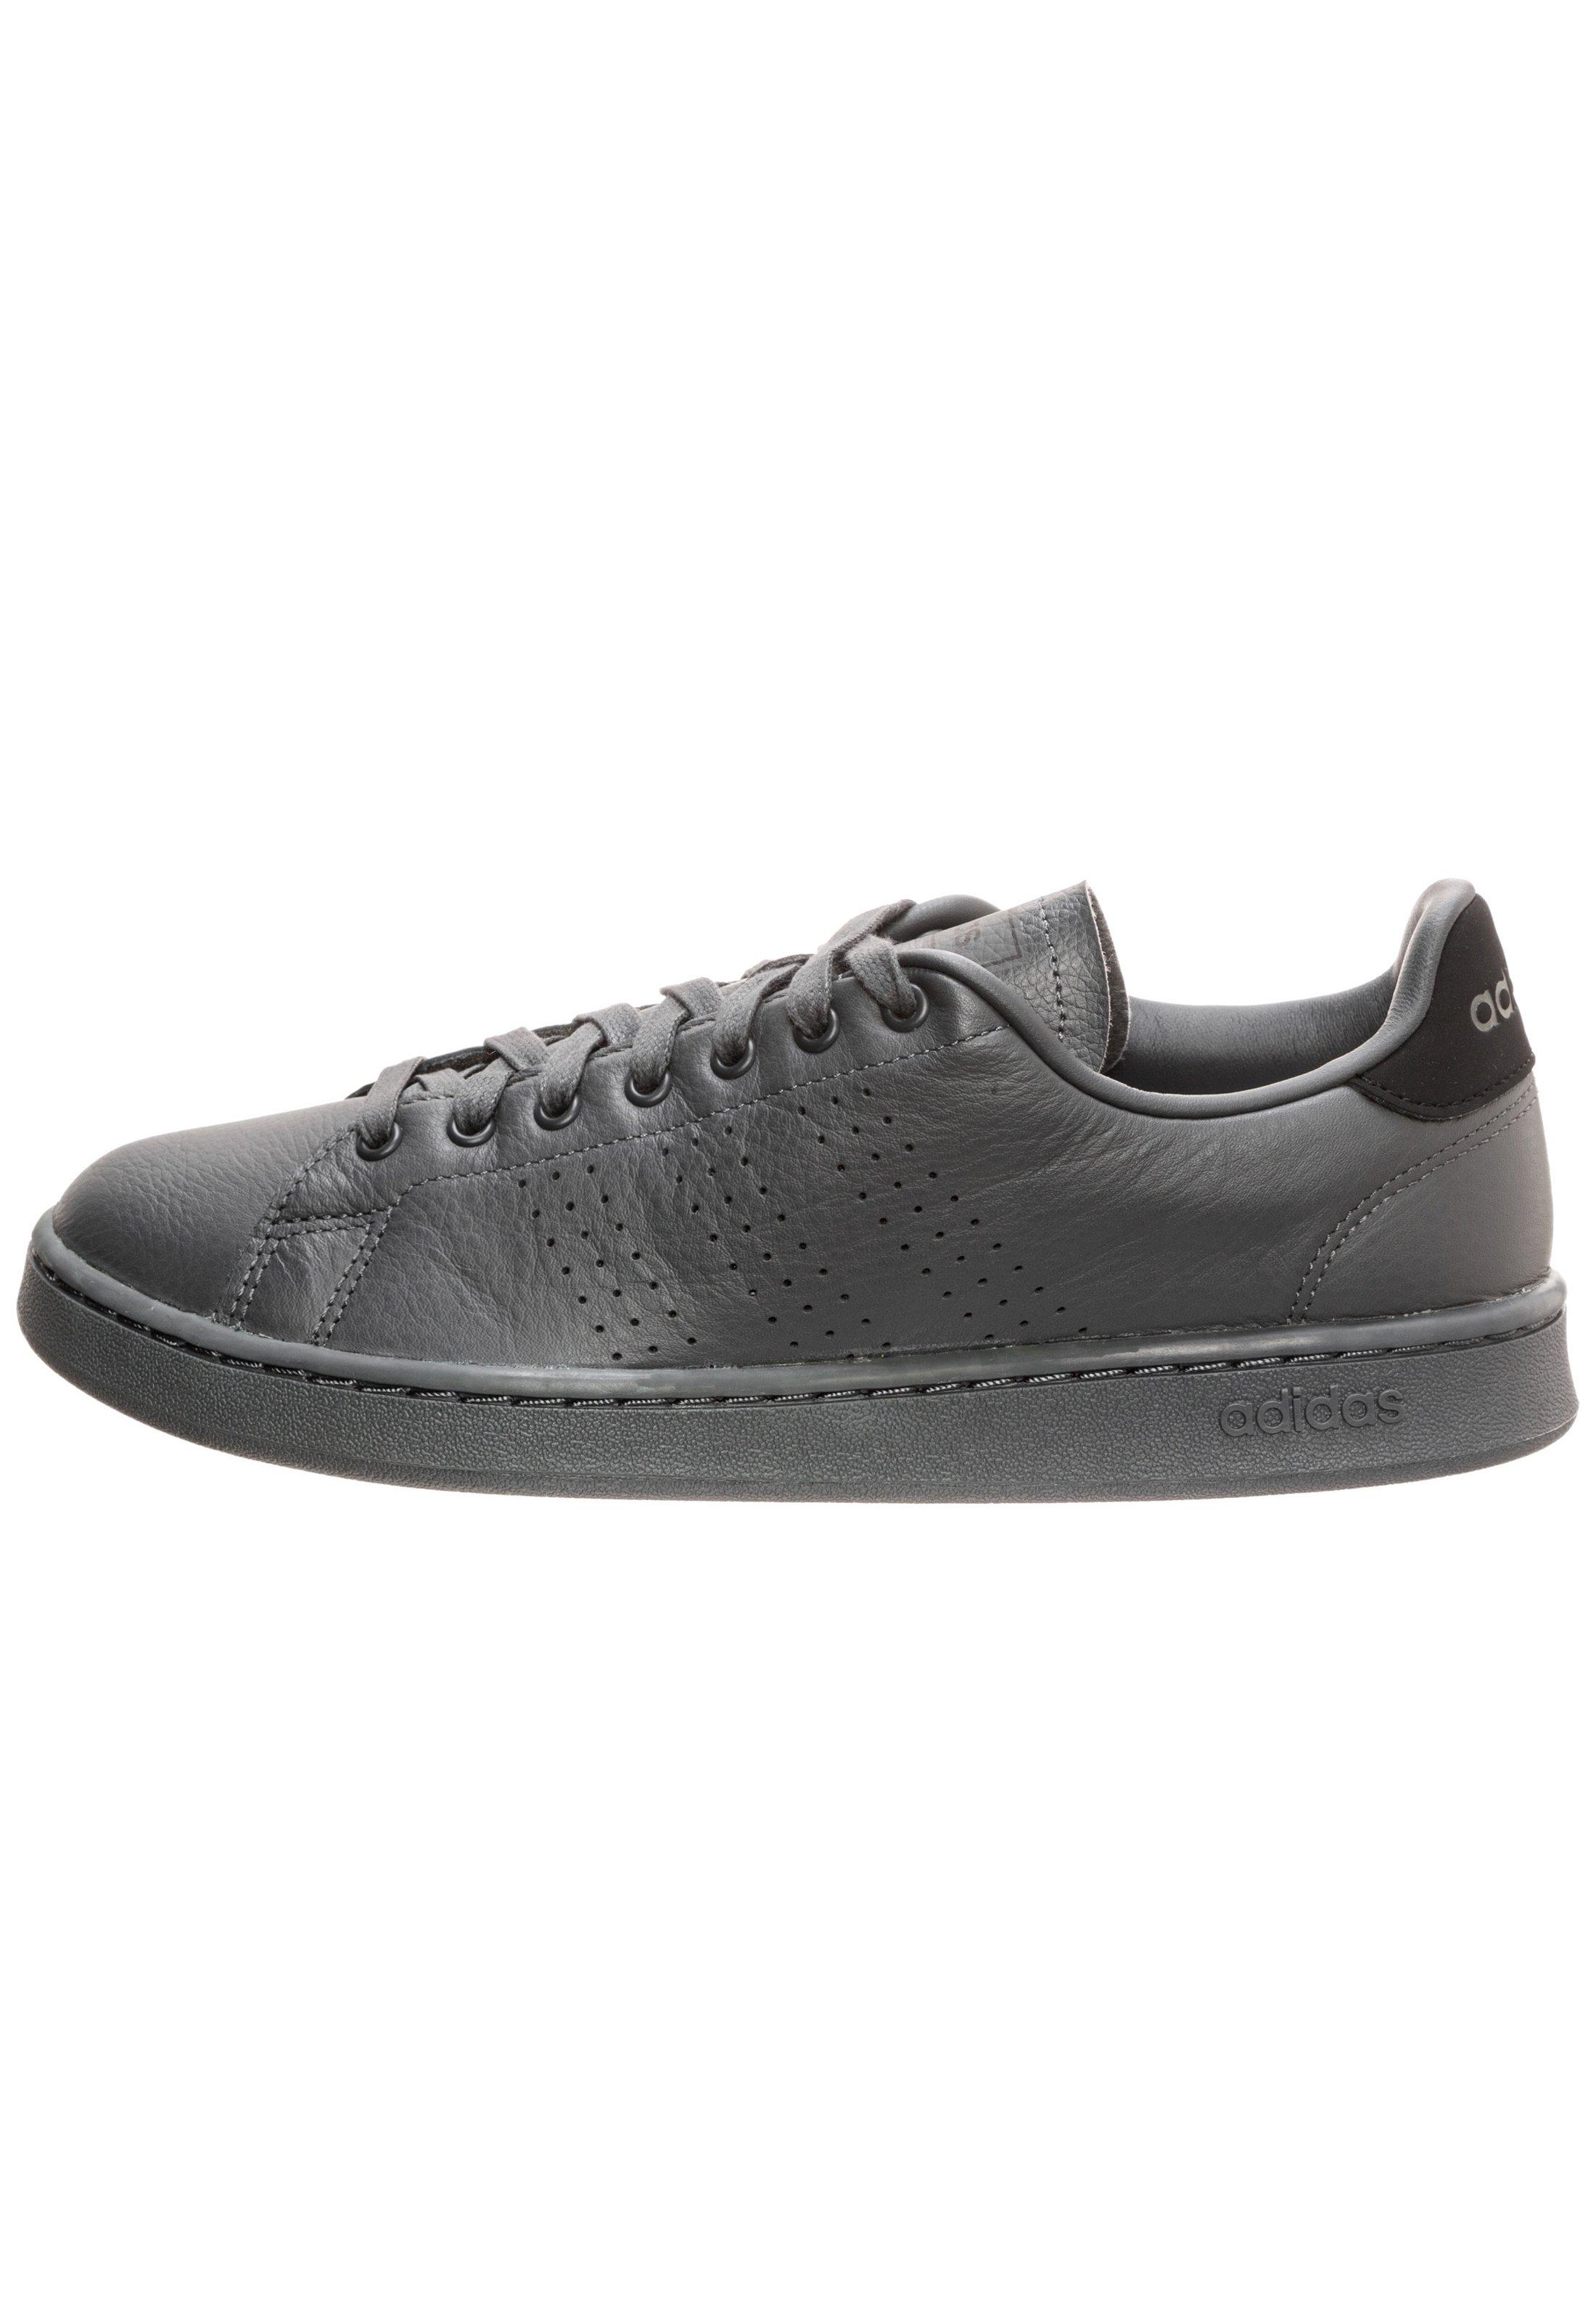 ADVANTAGE SNEAKER HERREN - Baskets basses - grey six / core black